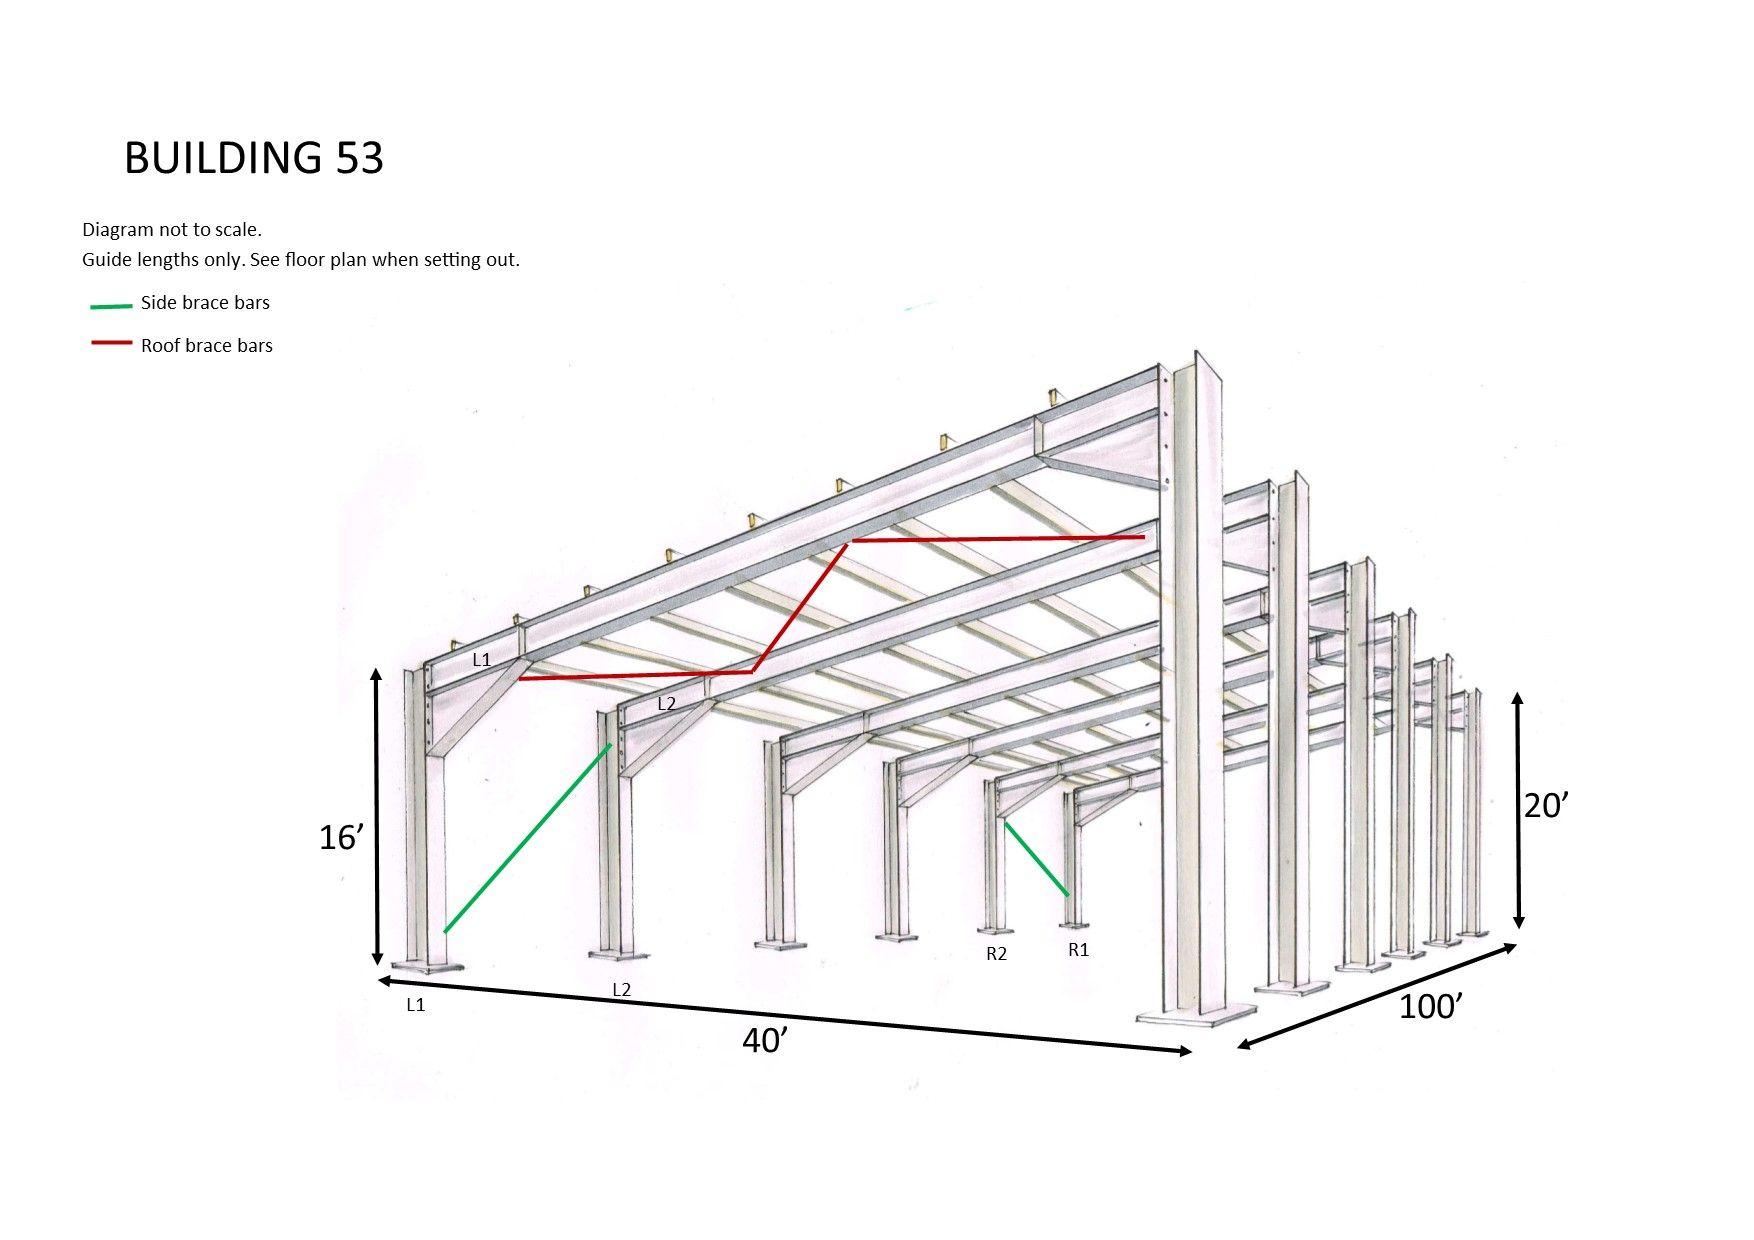 Steel Framed Building Mono Slope 100ft Long X40 Ft Wide X